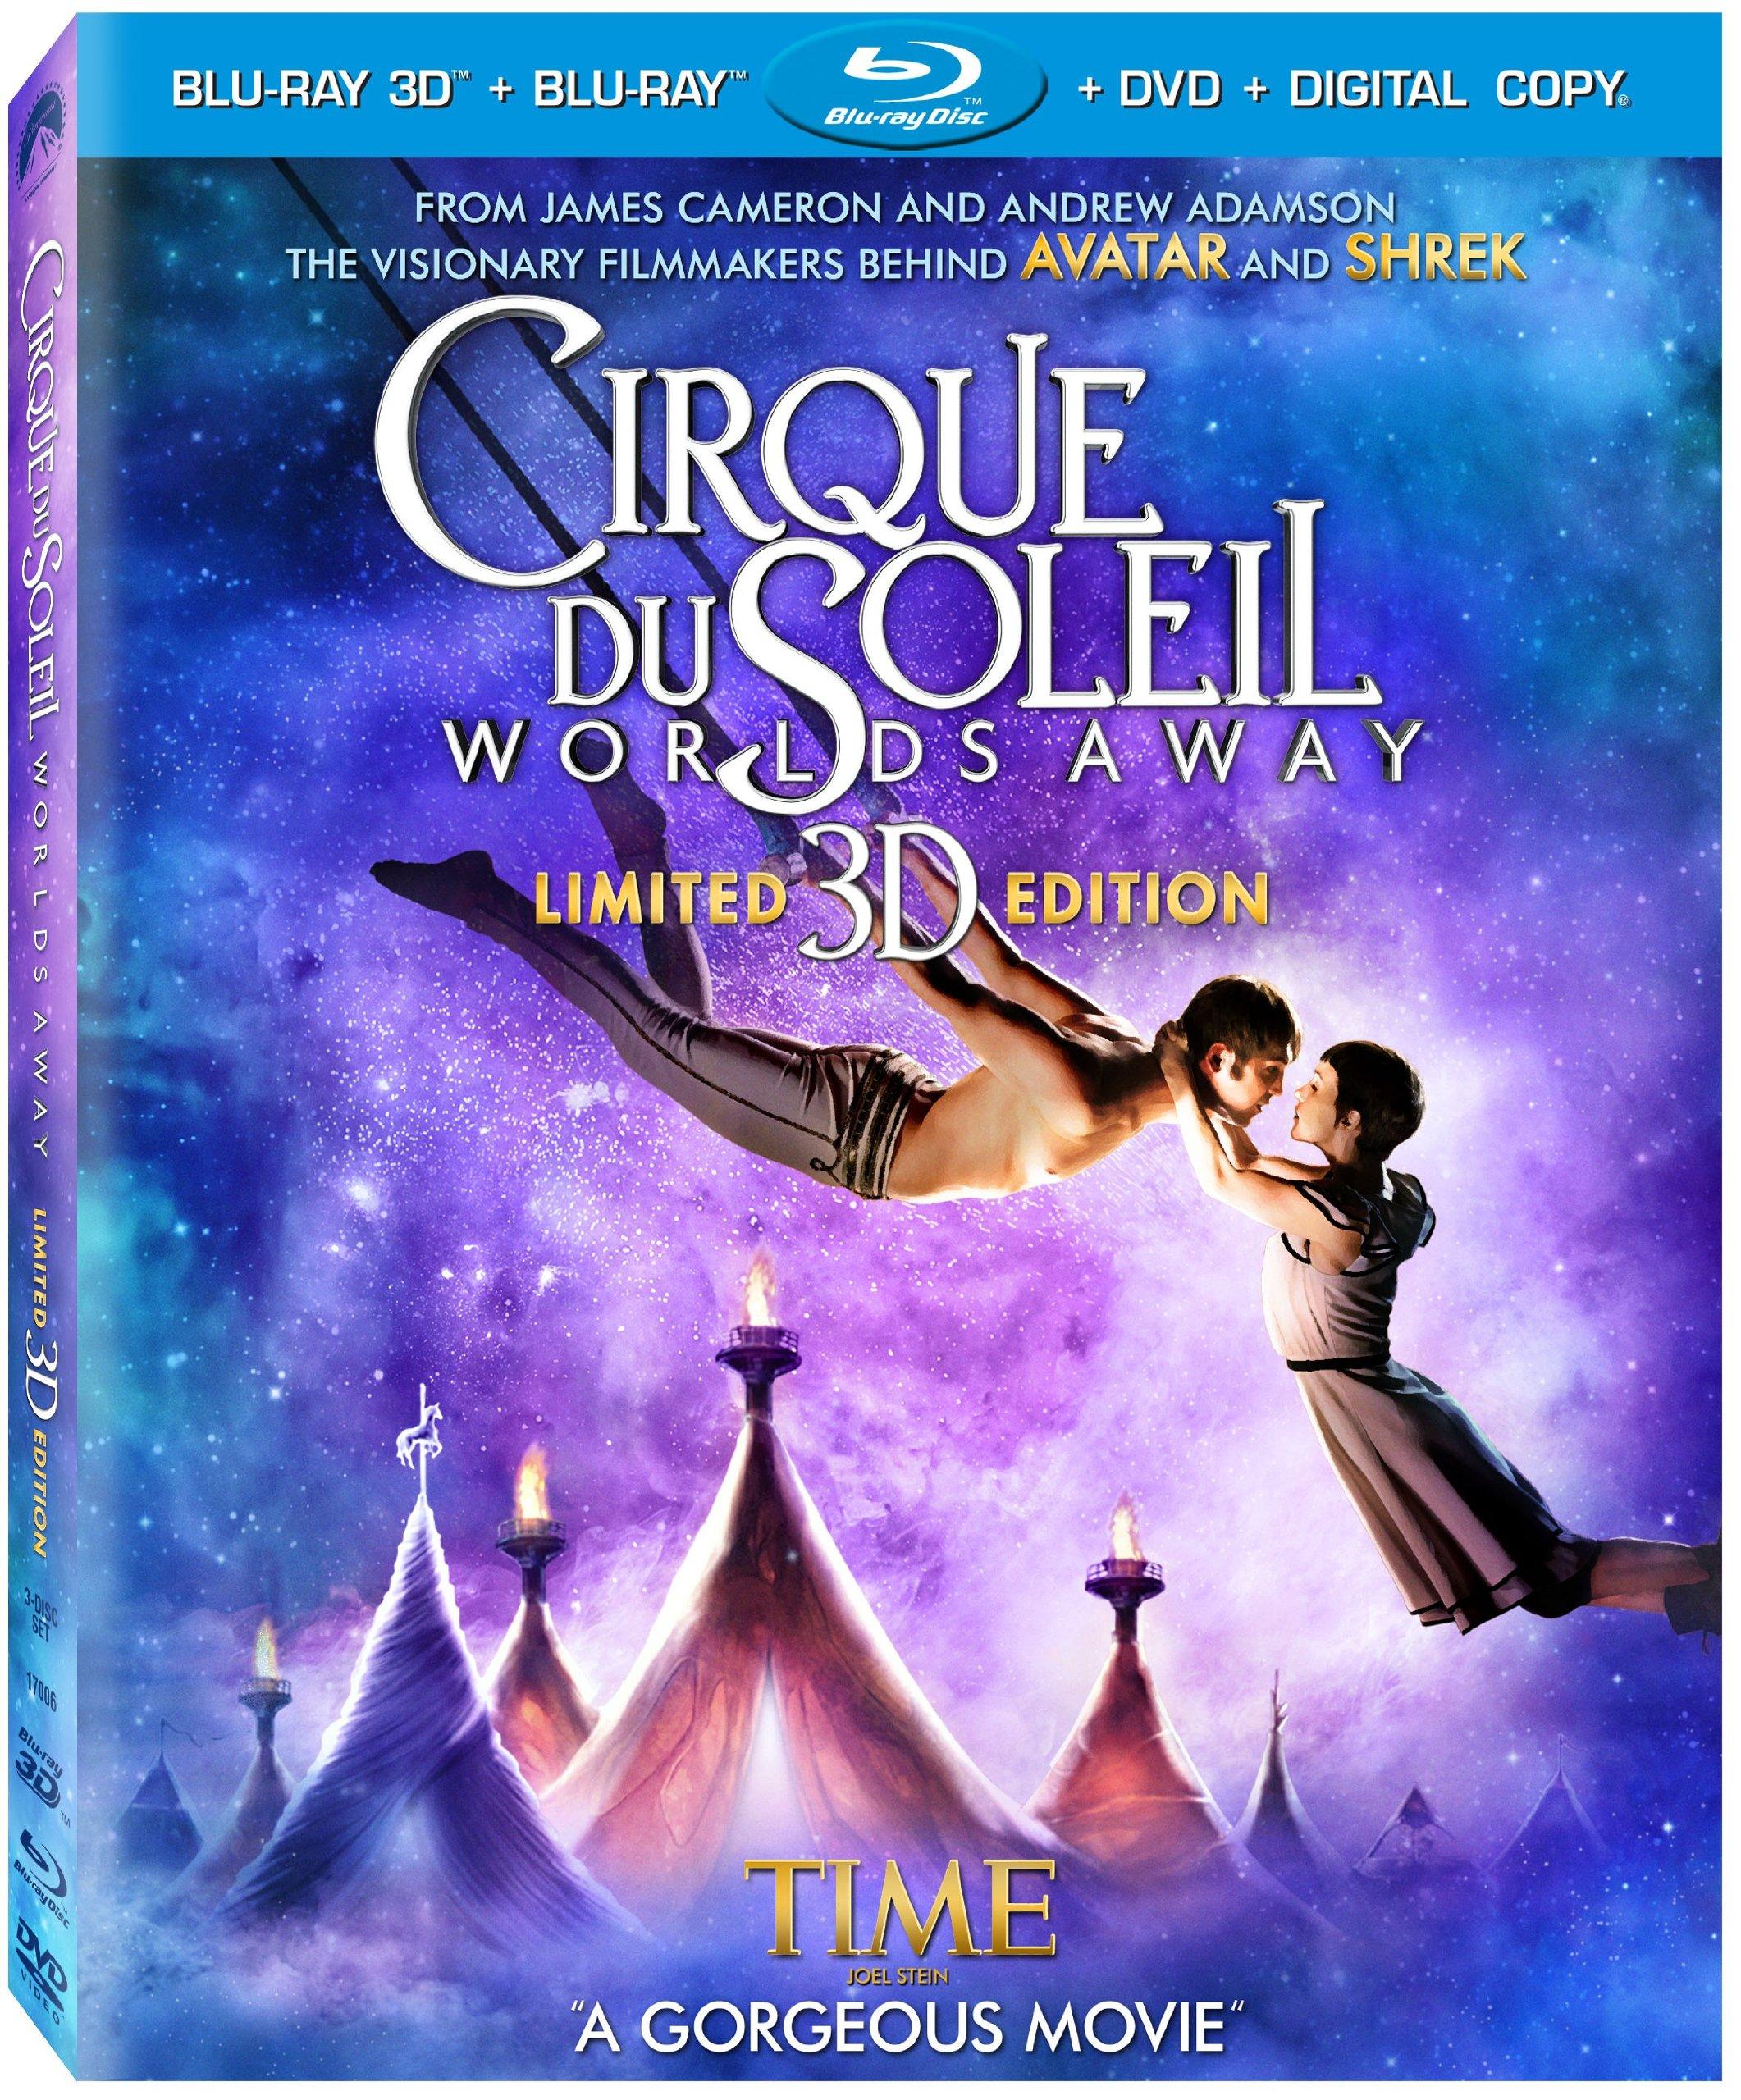 Cirque Du Soleil - Worlds Away (Three-Disc Combo: Blu-ray 3D / Blu-ray / DVD / Digital Copy) by Paramount